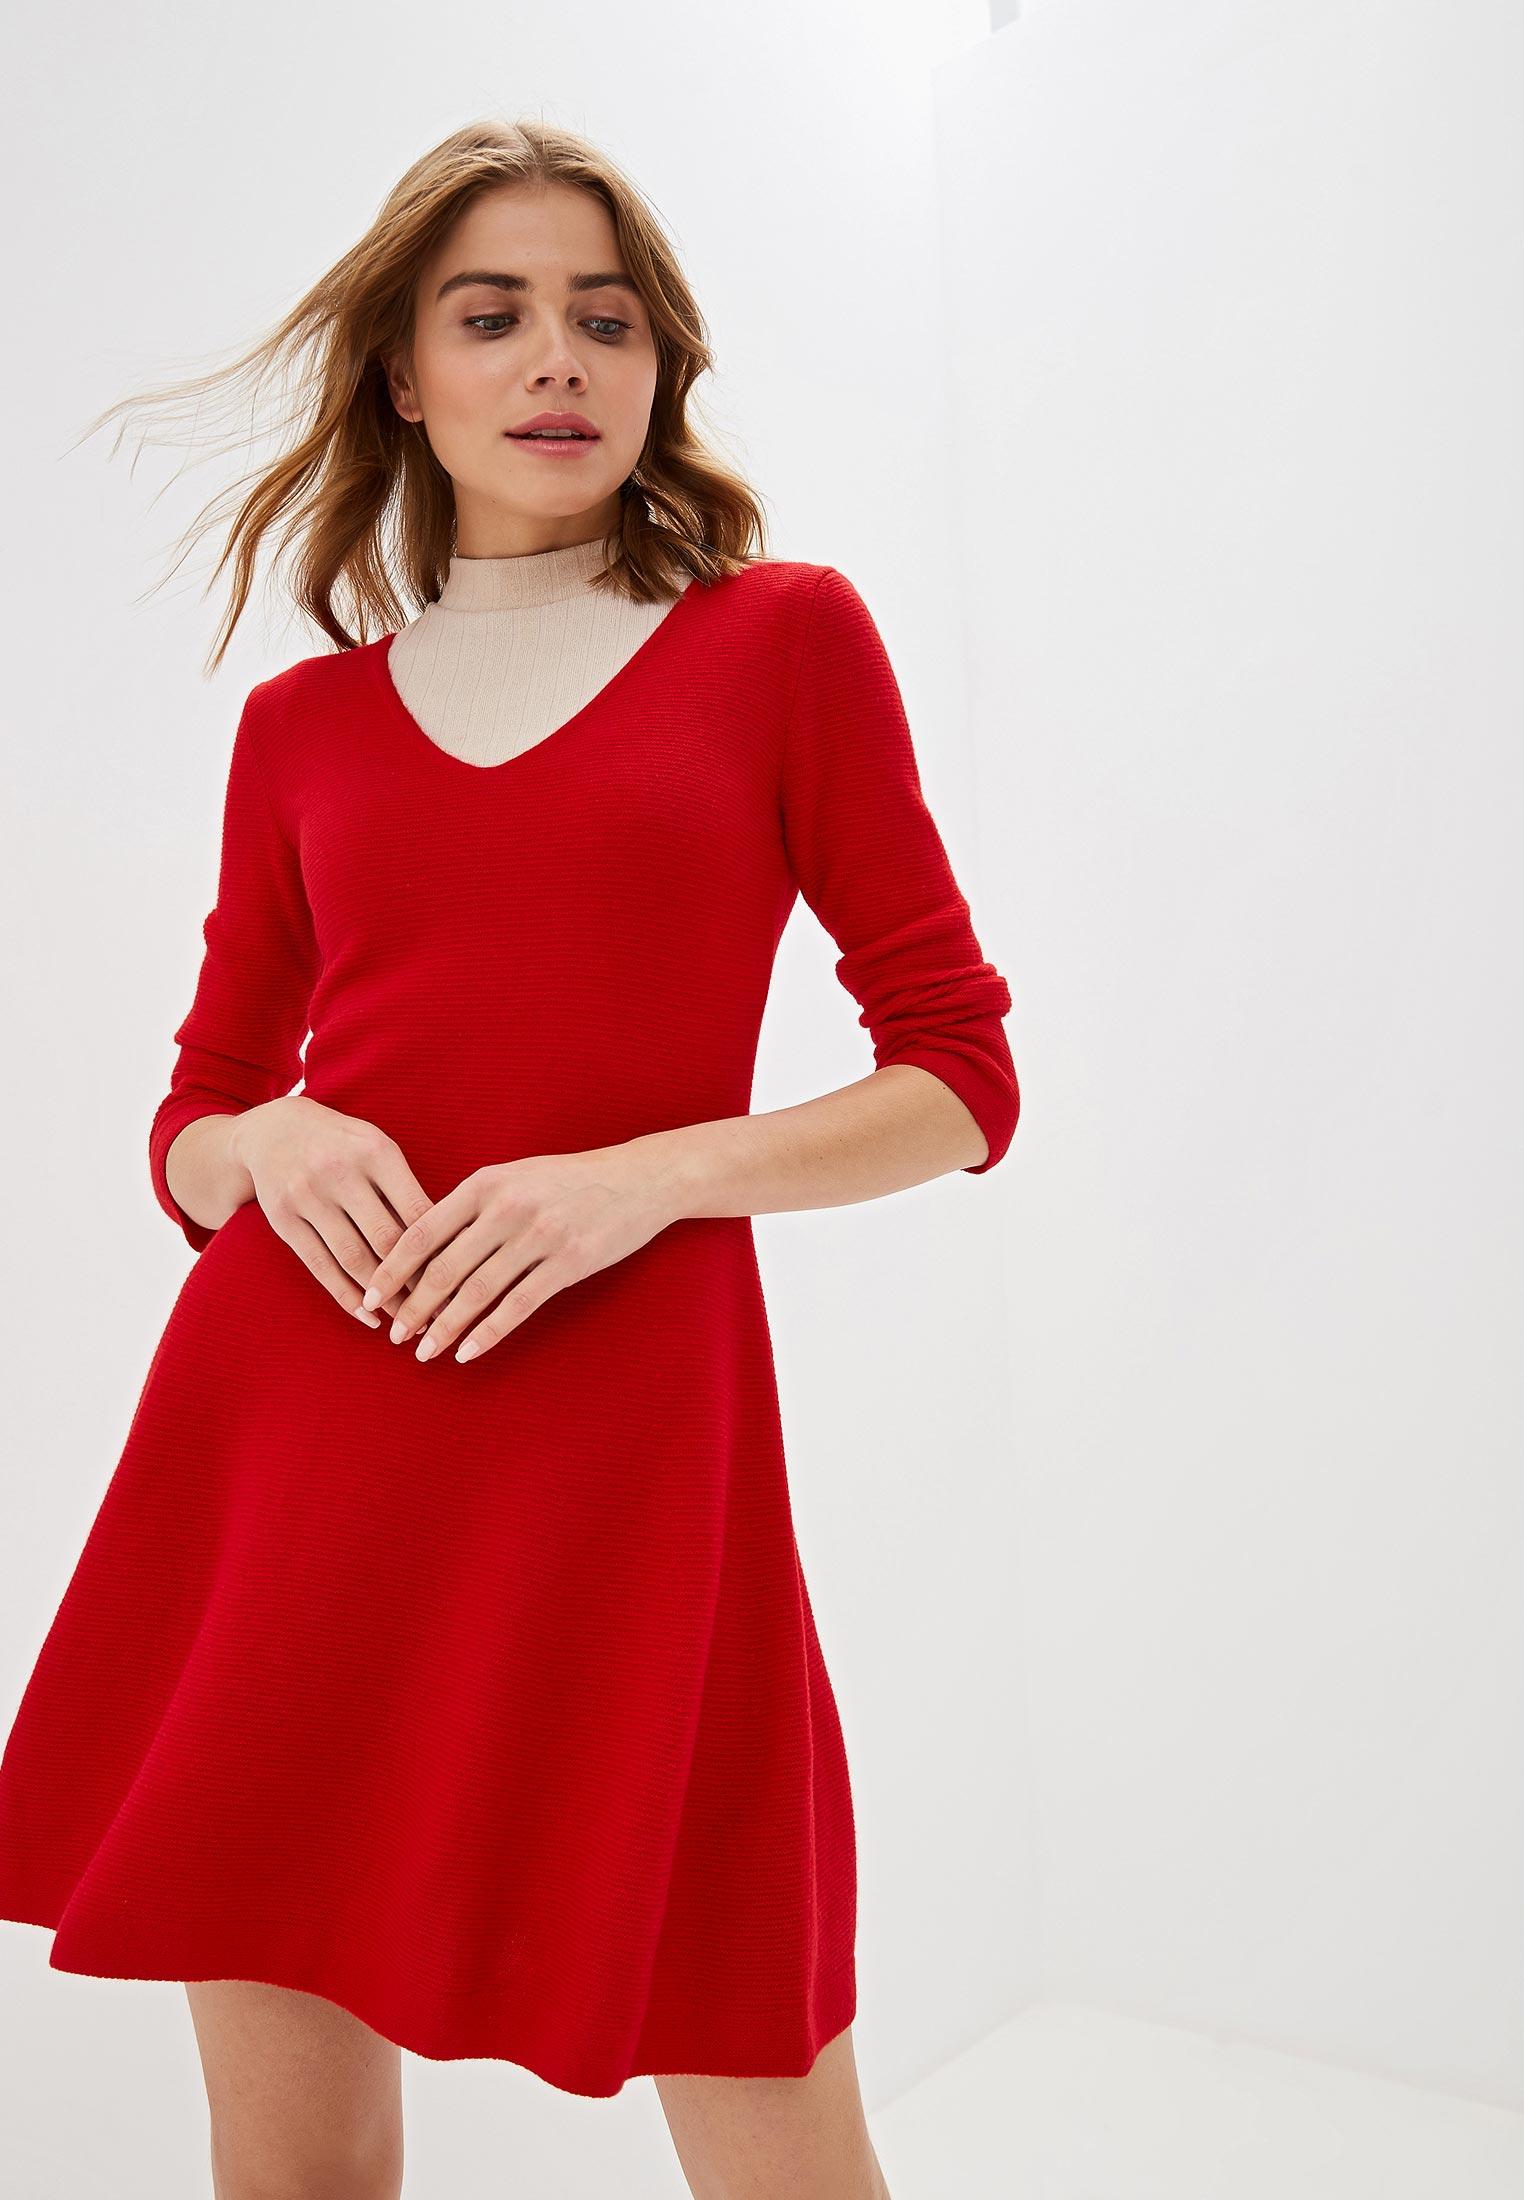 Вязаное платье United Colors of Benetton (Юнайтед Колорс оф Бенеттон) 1044V4549